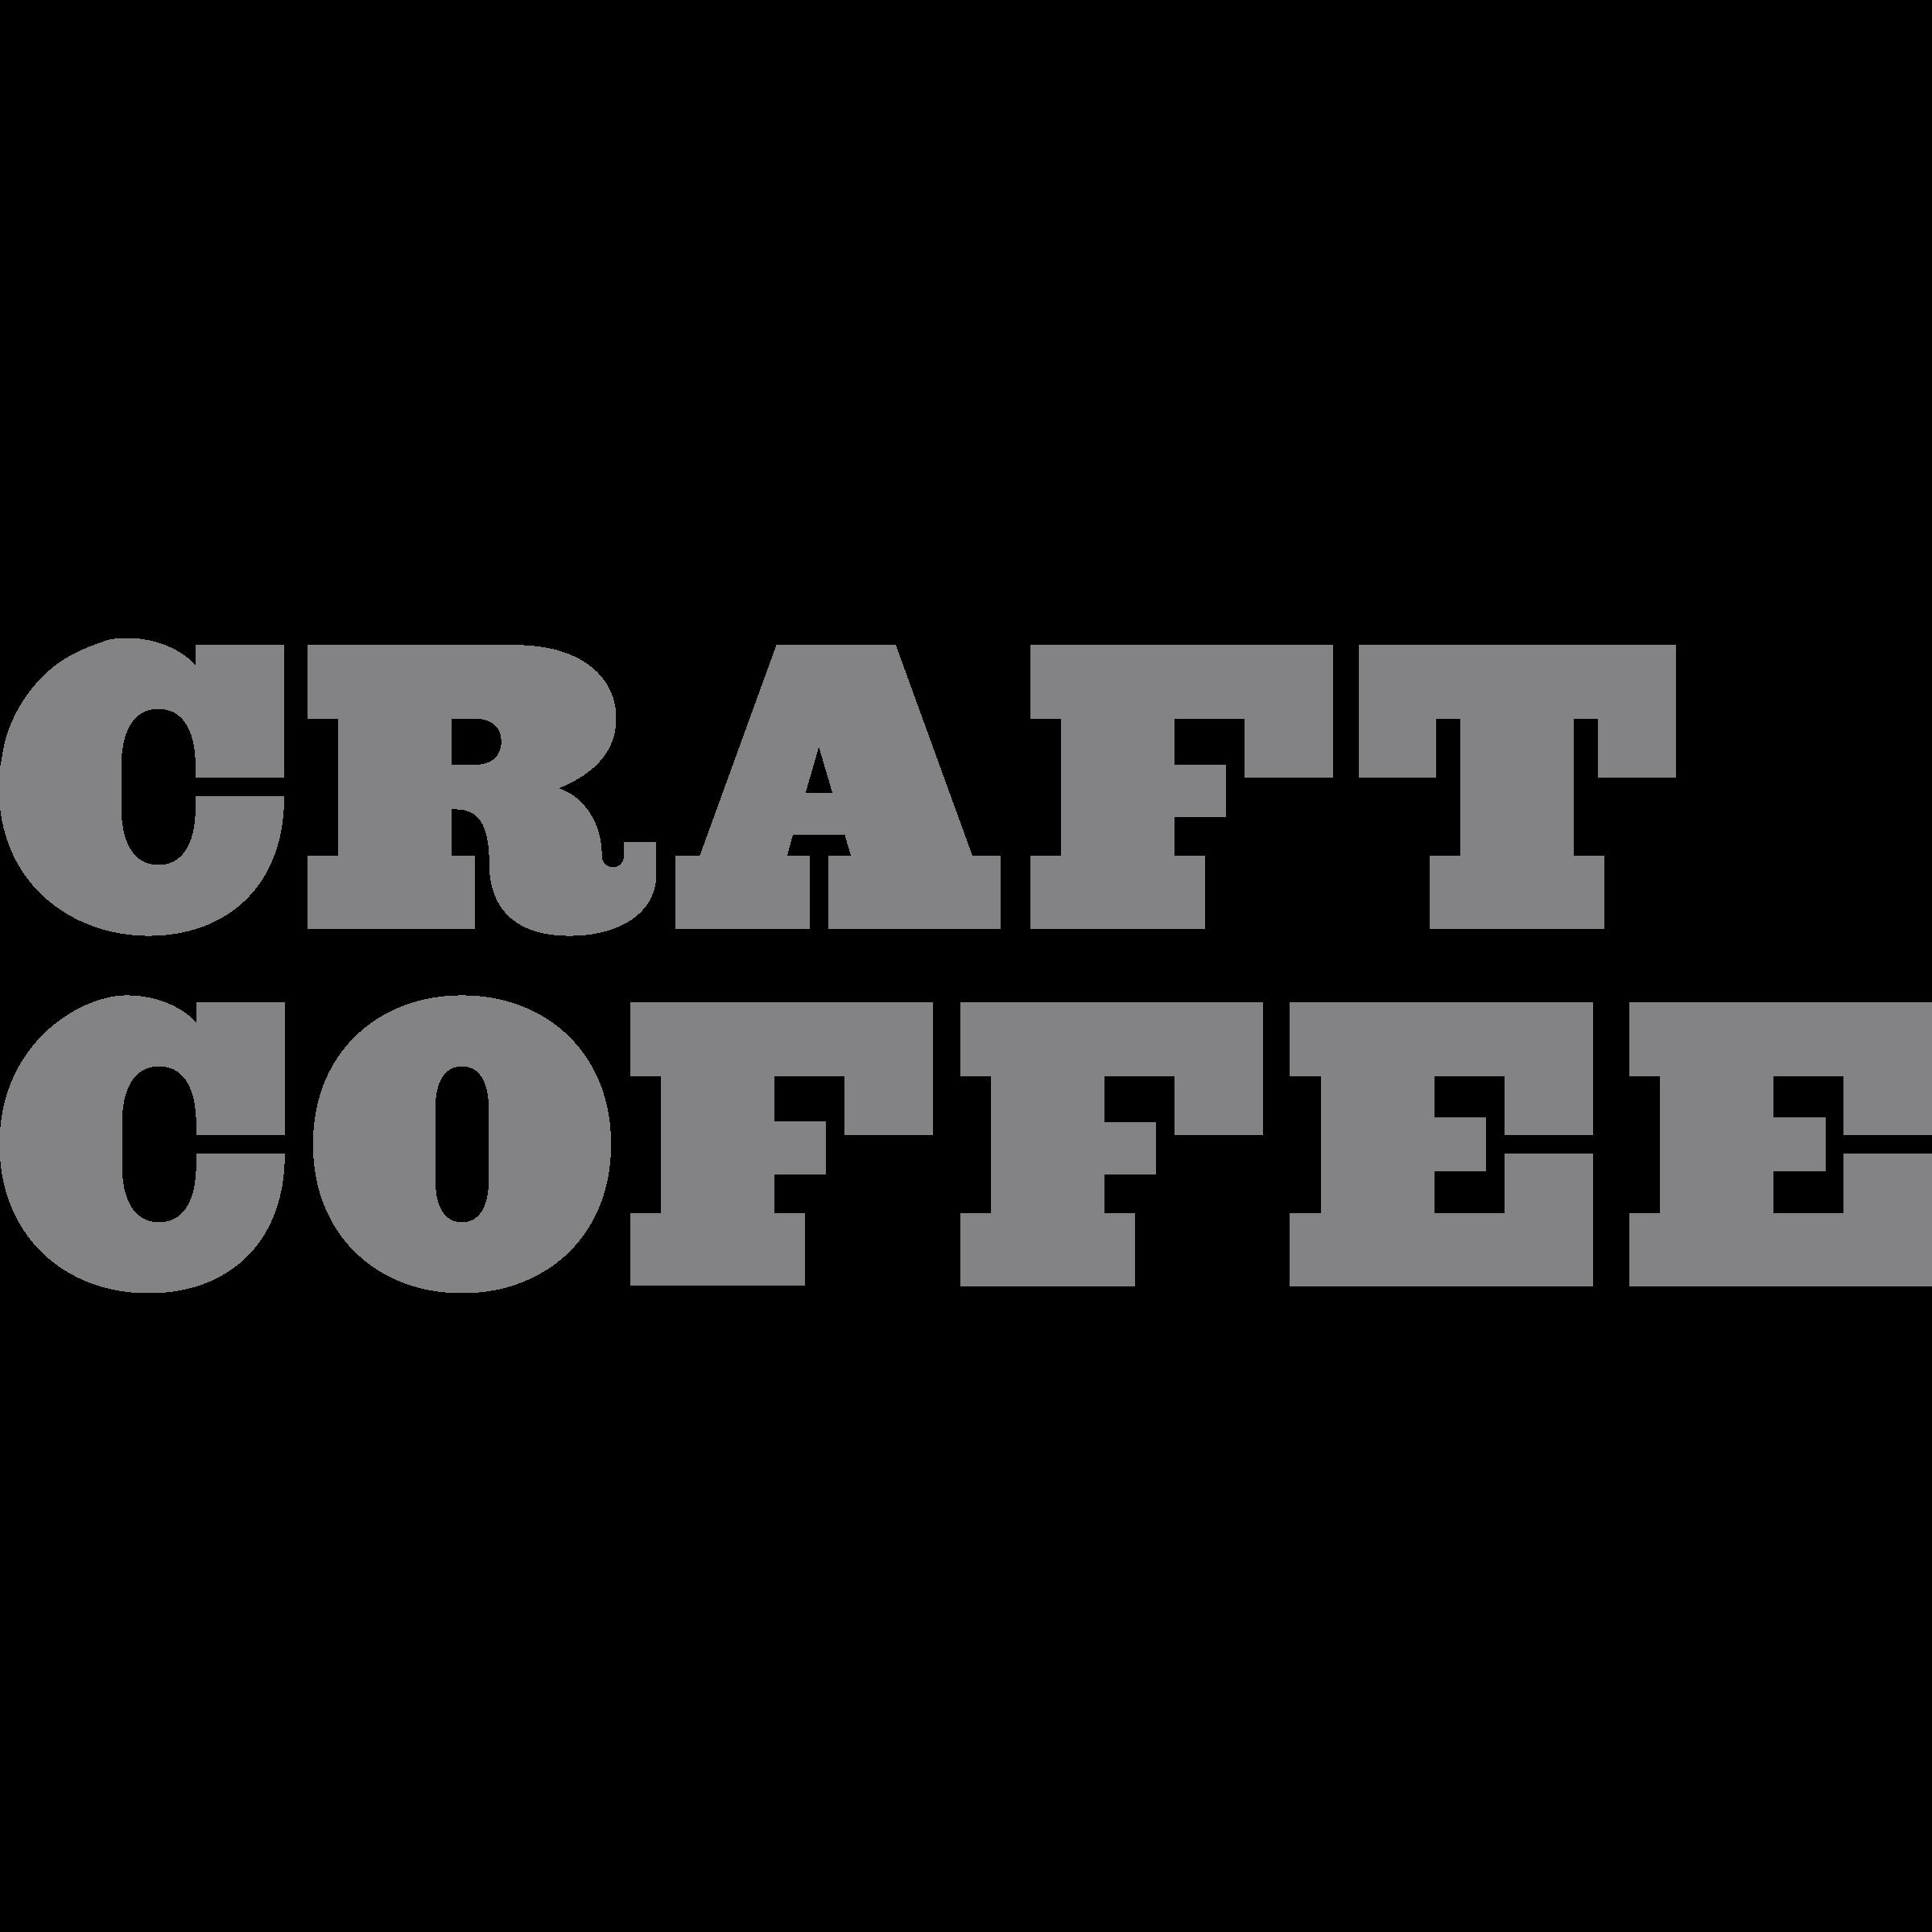 craft.png